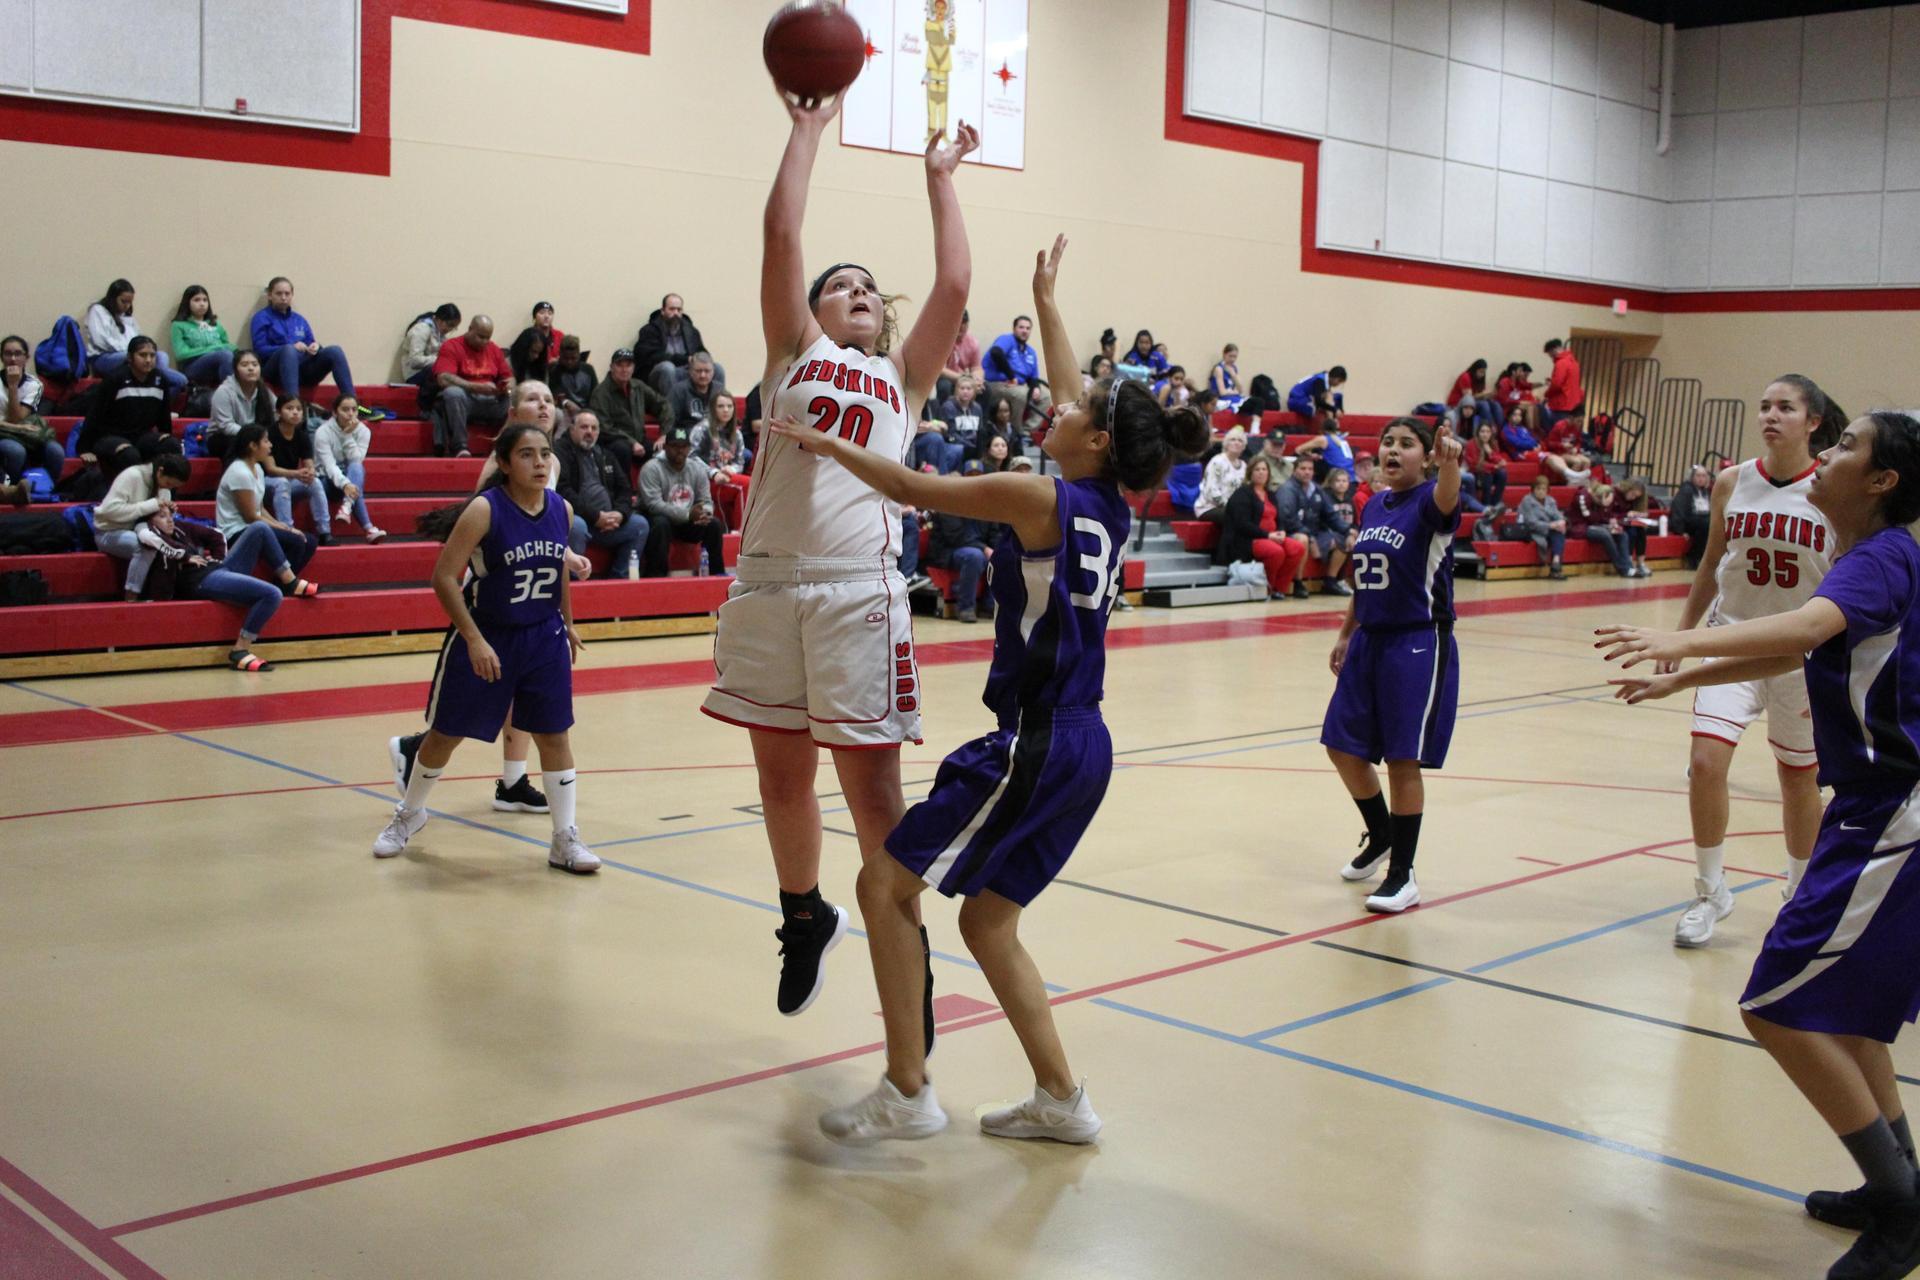 Junior Varsity girls playing basketball against Pacheco